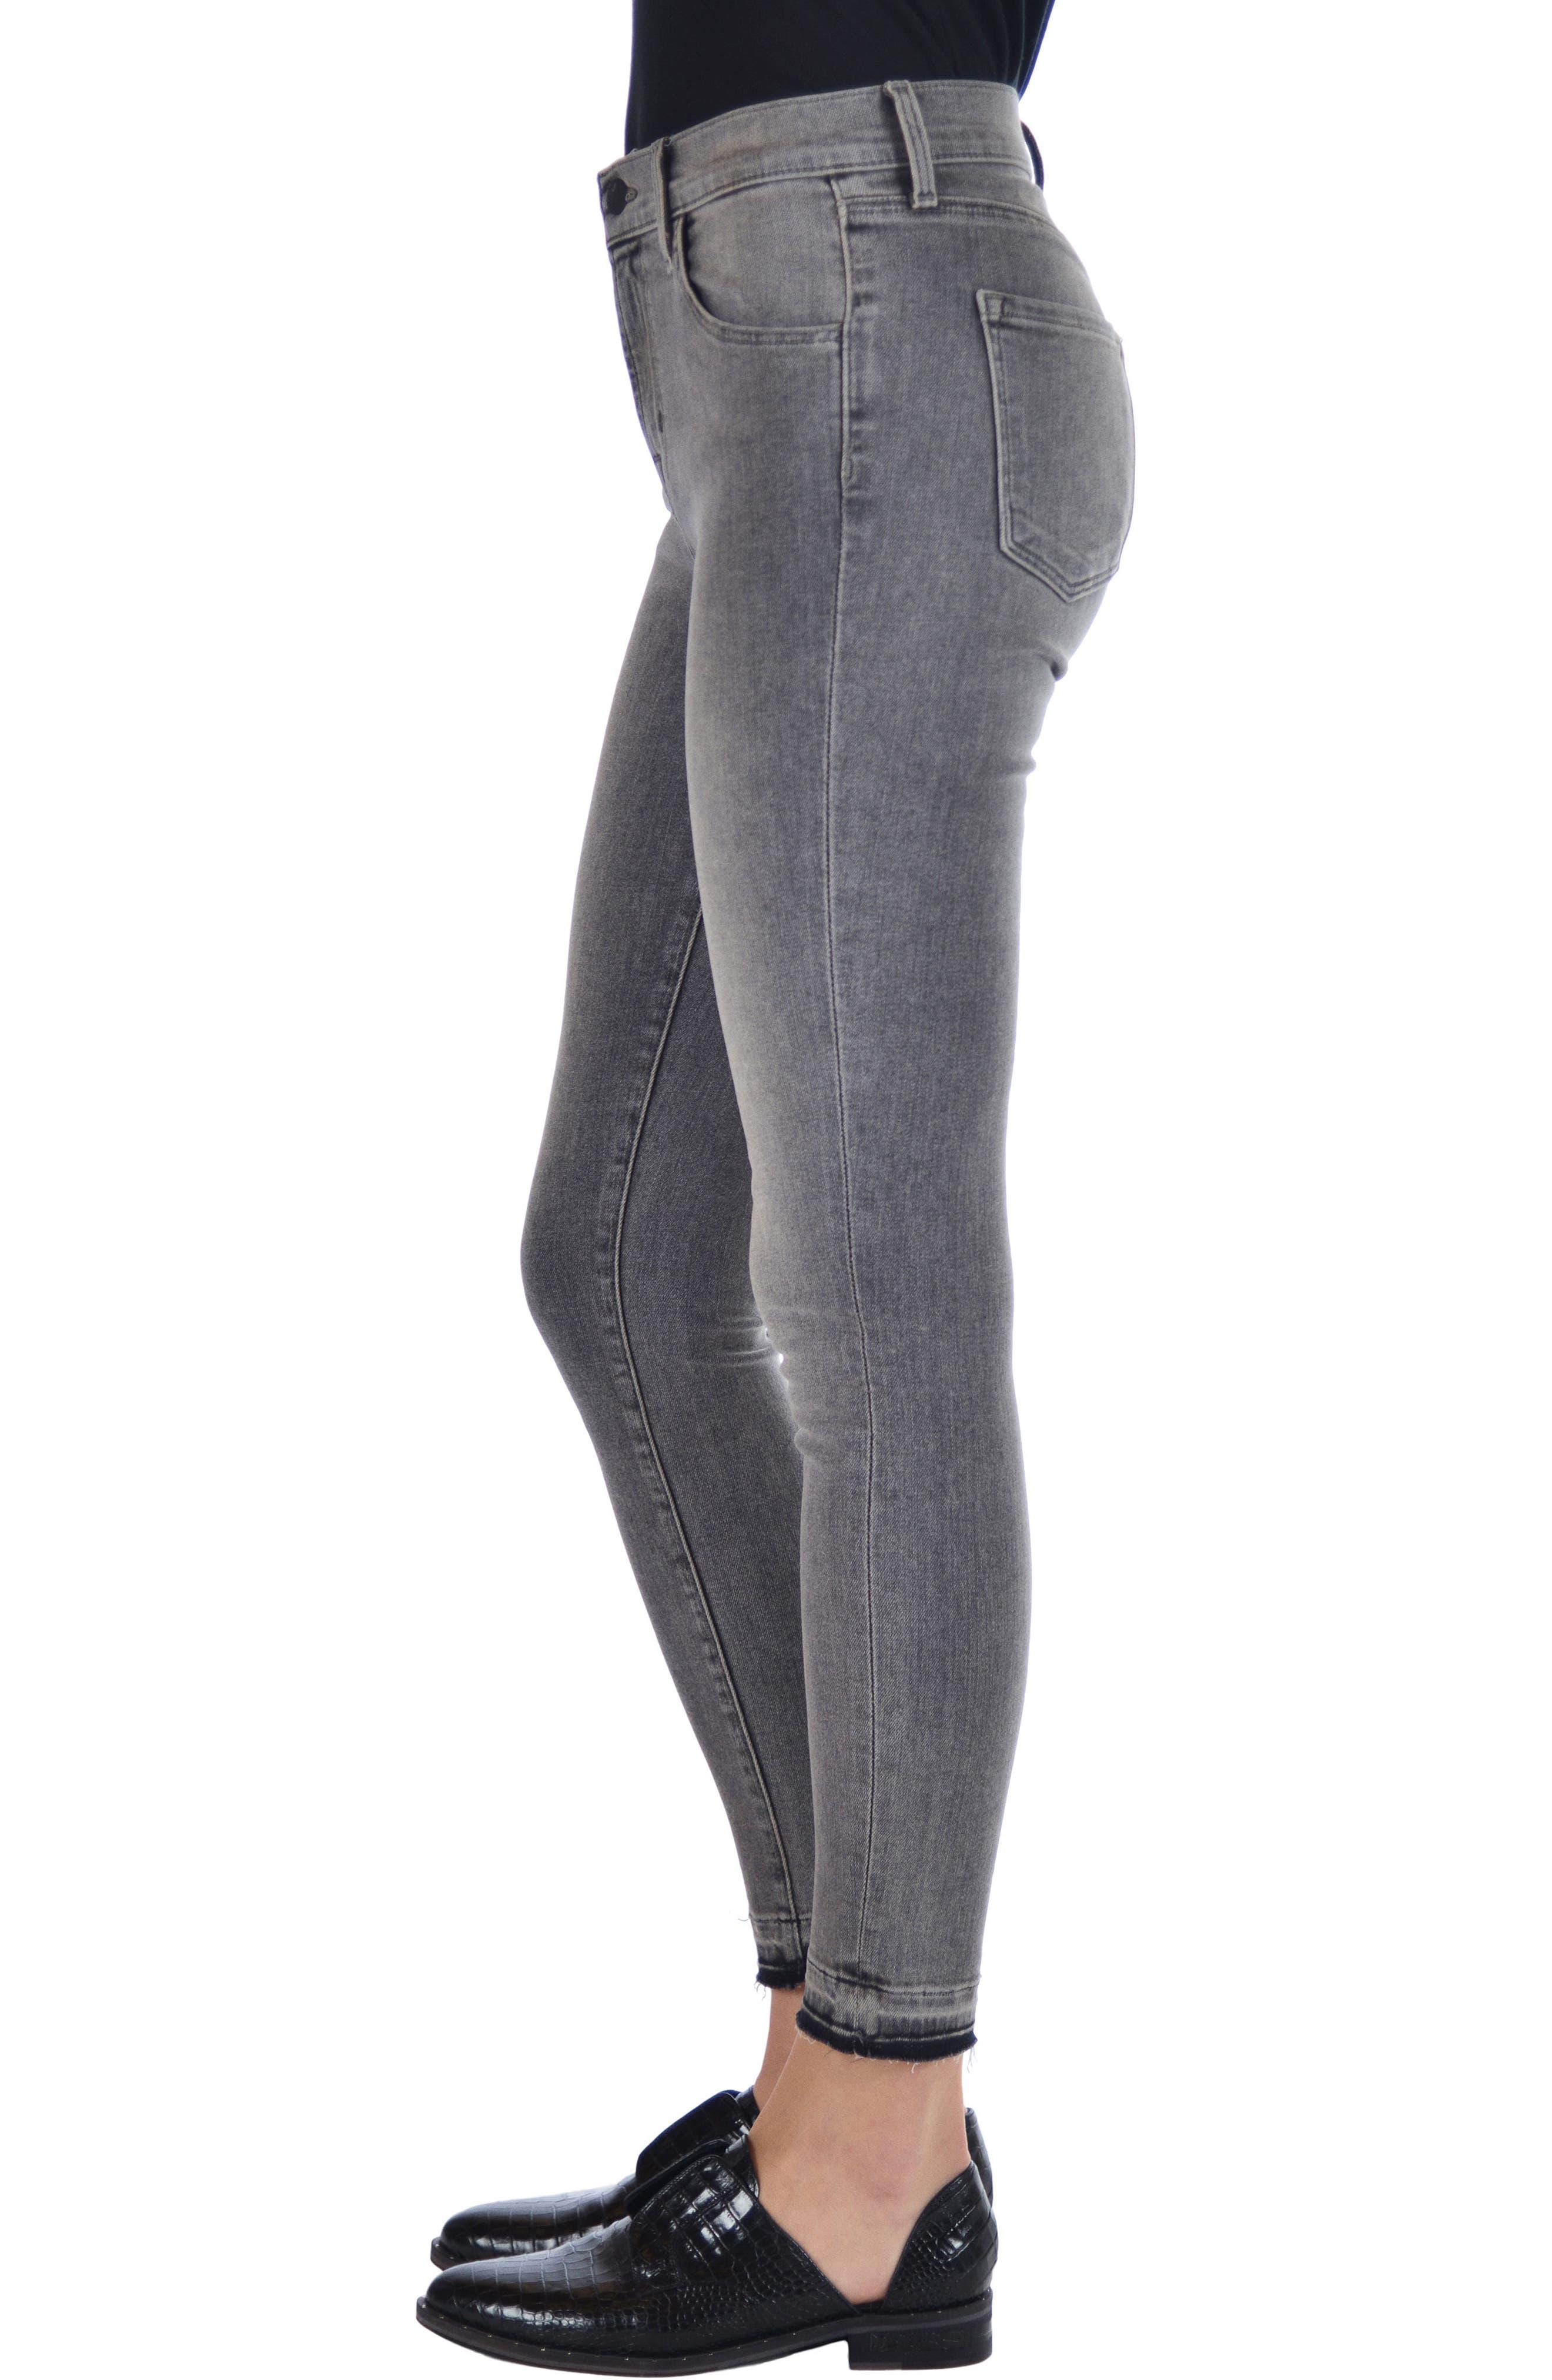 Alana High Waist Ankle Skinny Jeans,                             Alternate thumbnail 3, color,                             030